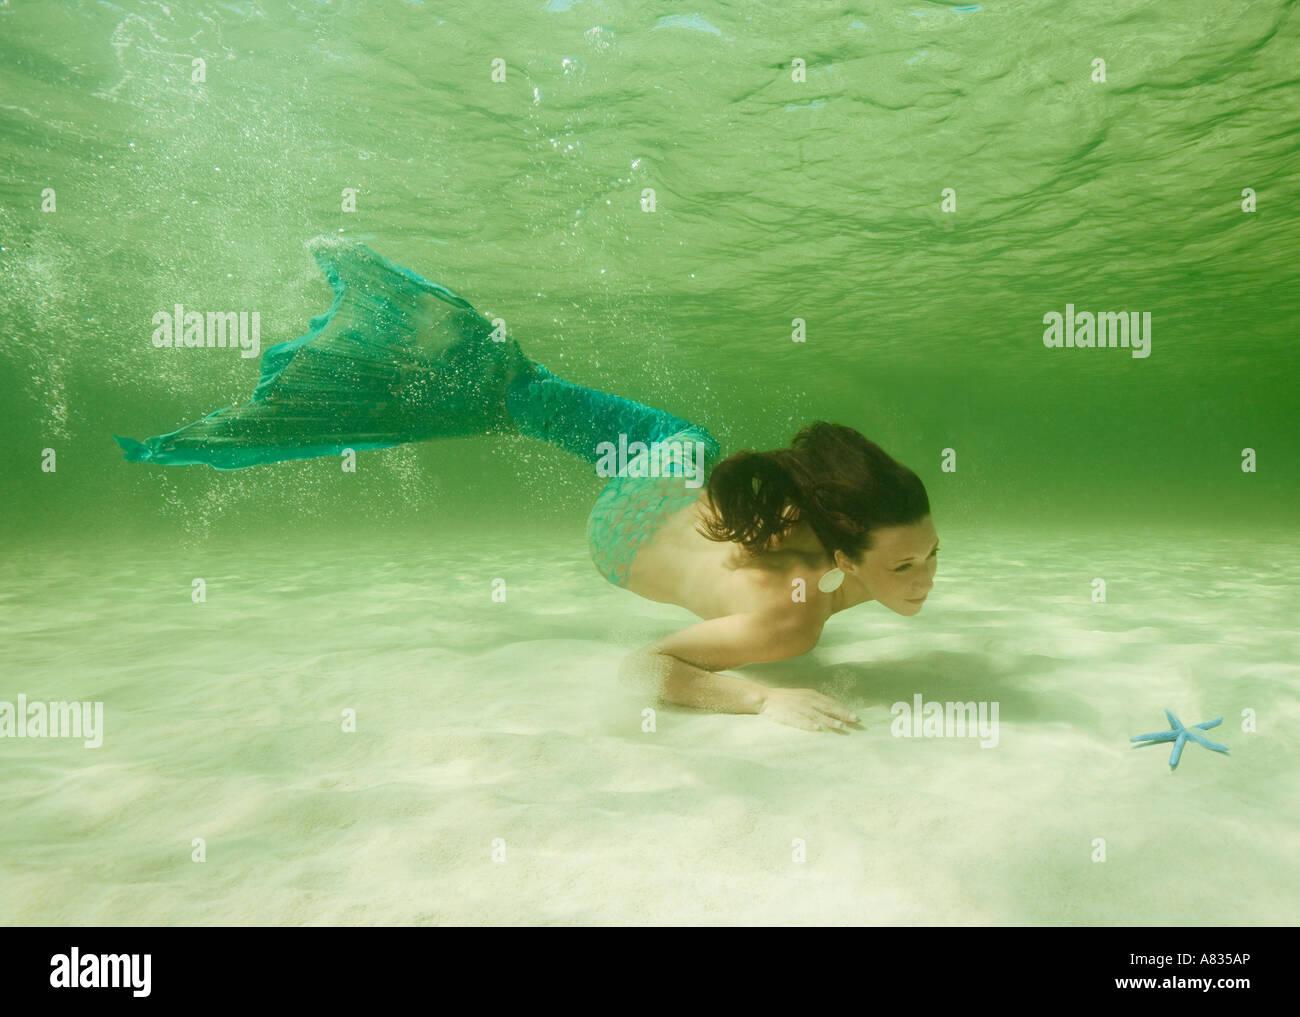 Mermaid en aguas poco profundas a lo largo de fondo arenoso Conch Tree Beach Cozumel México Imagen De Stock